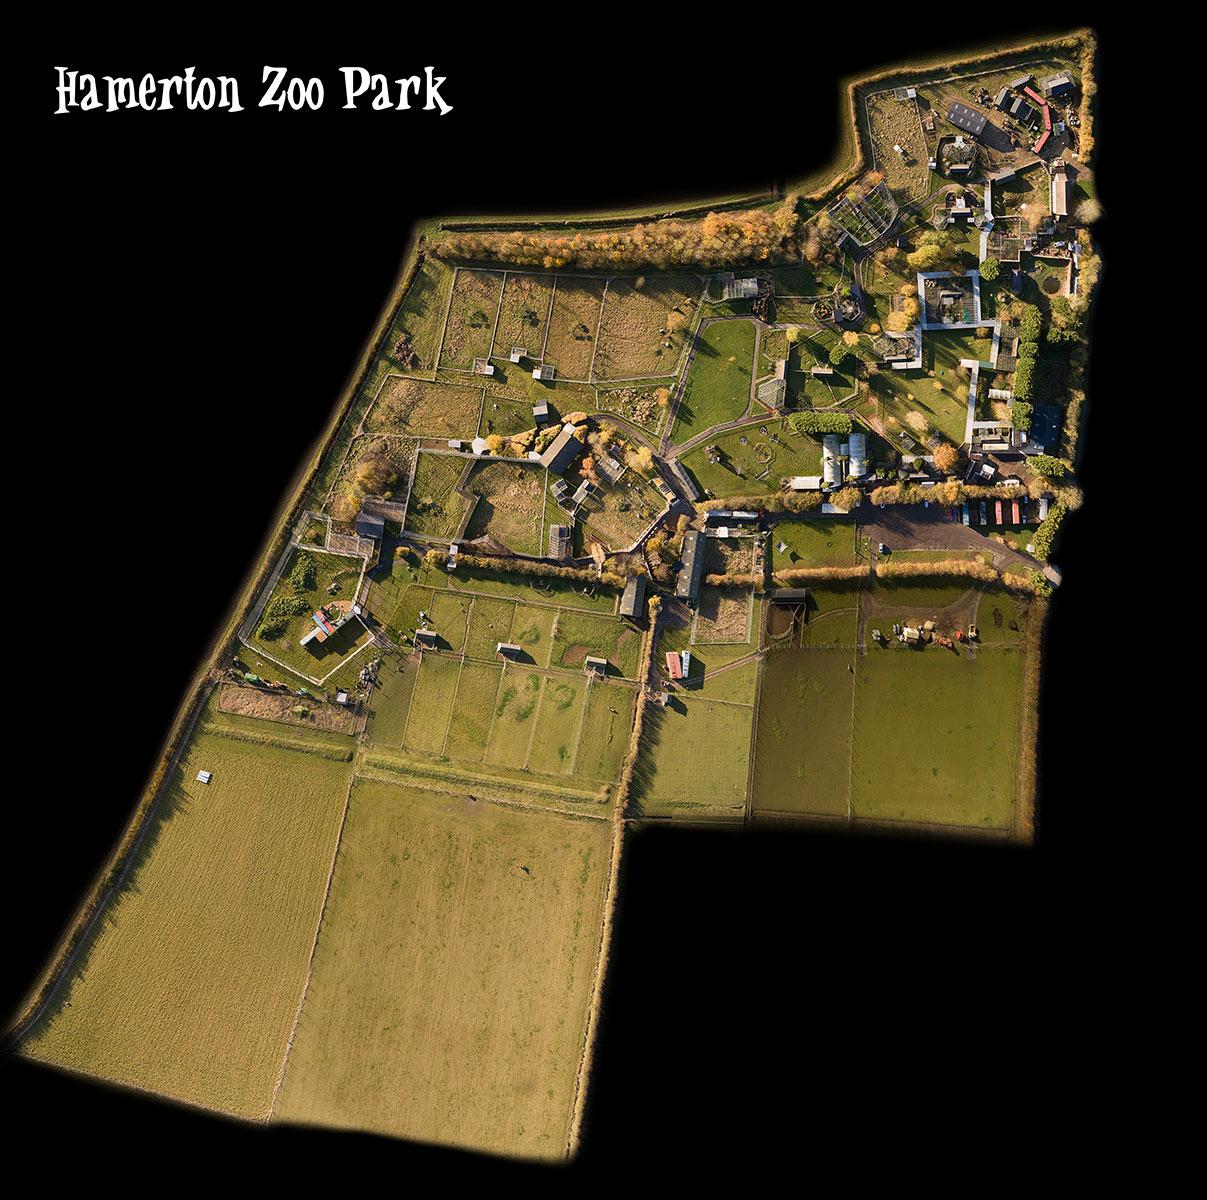 Hamerton Zoo Park - aerial photography